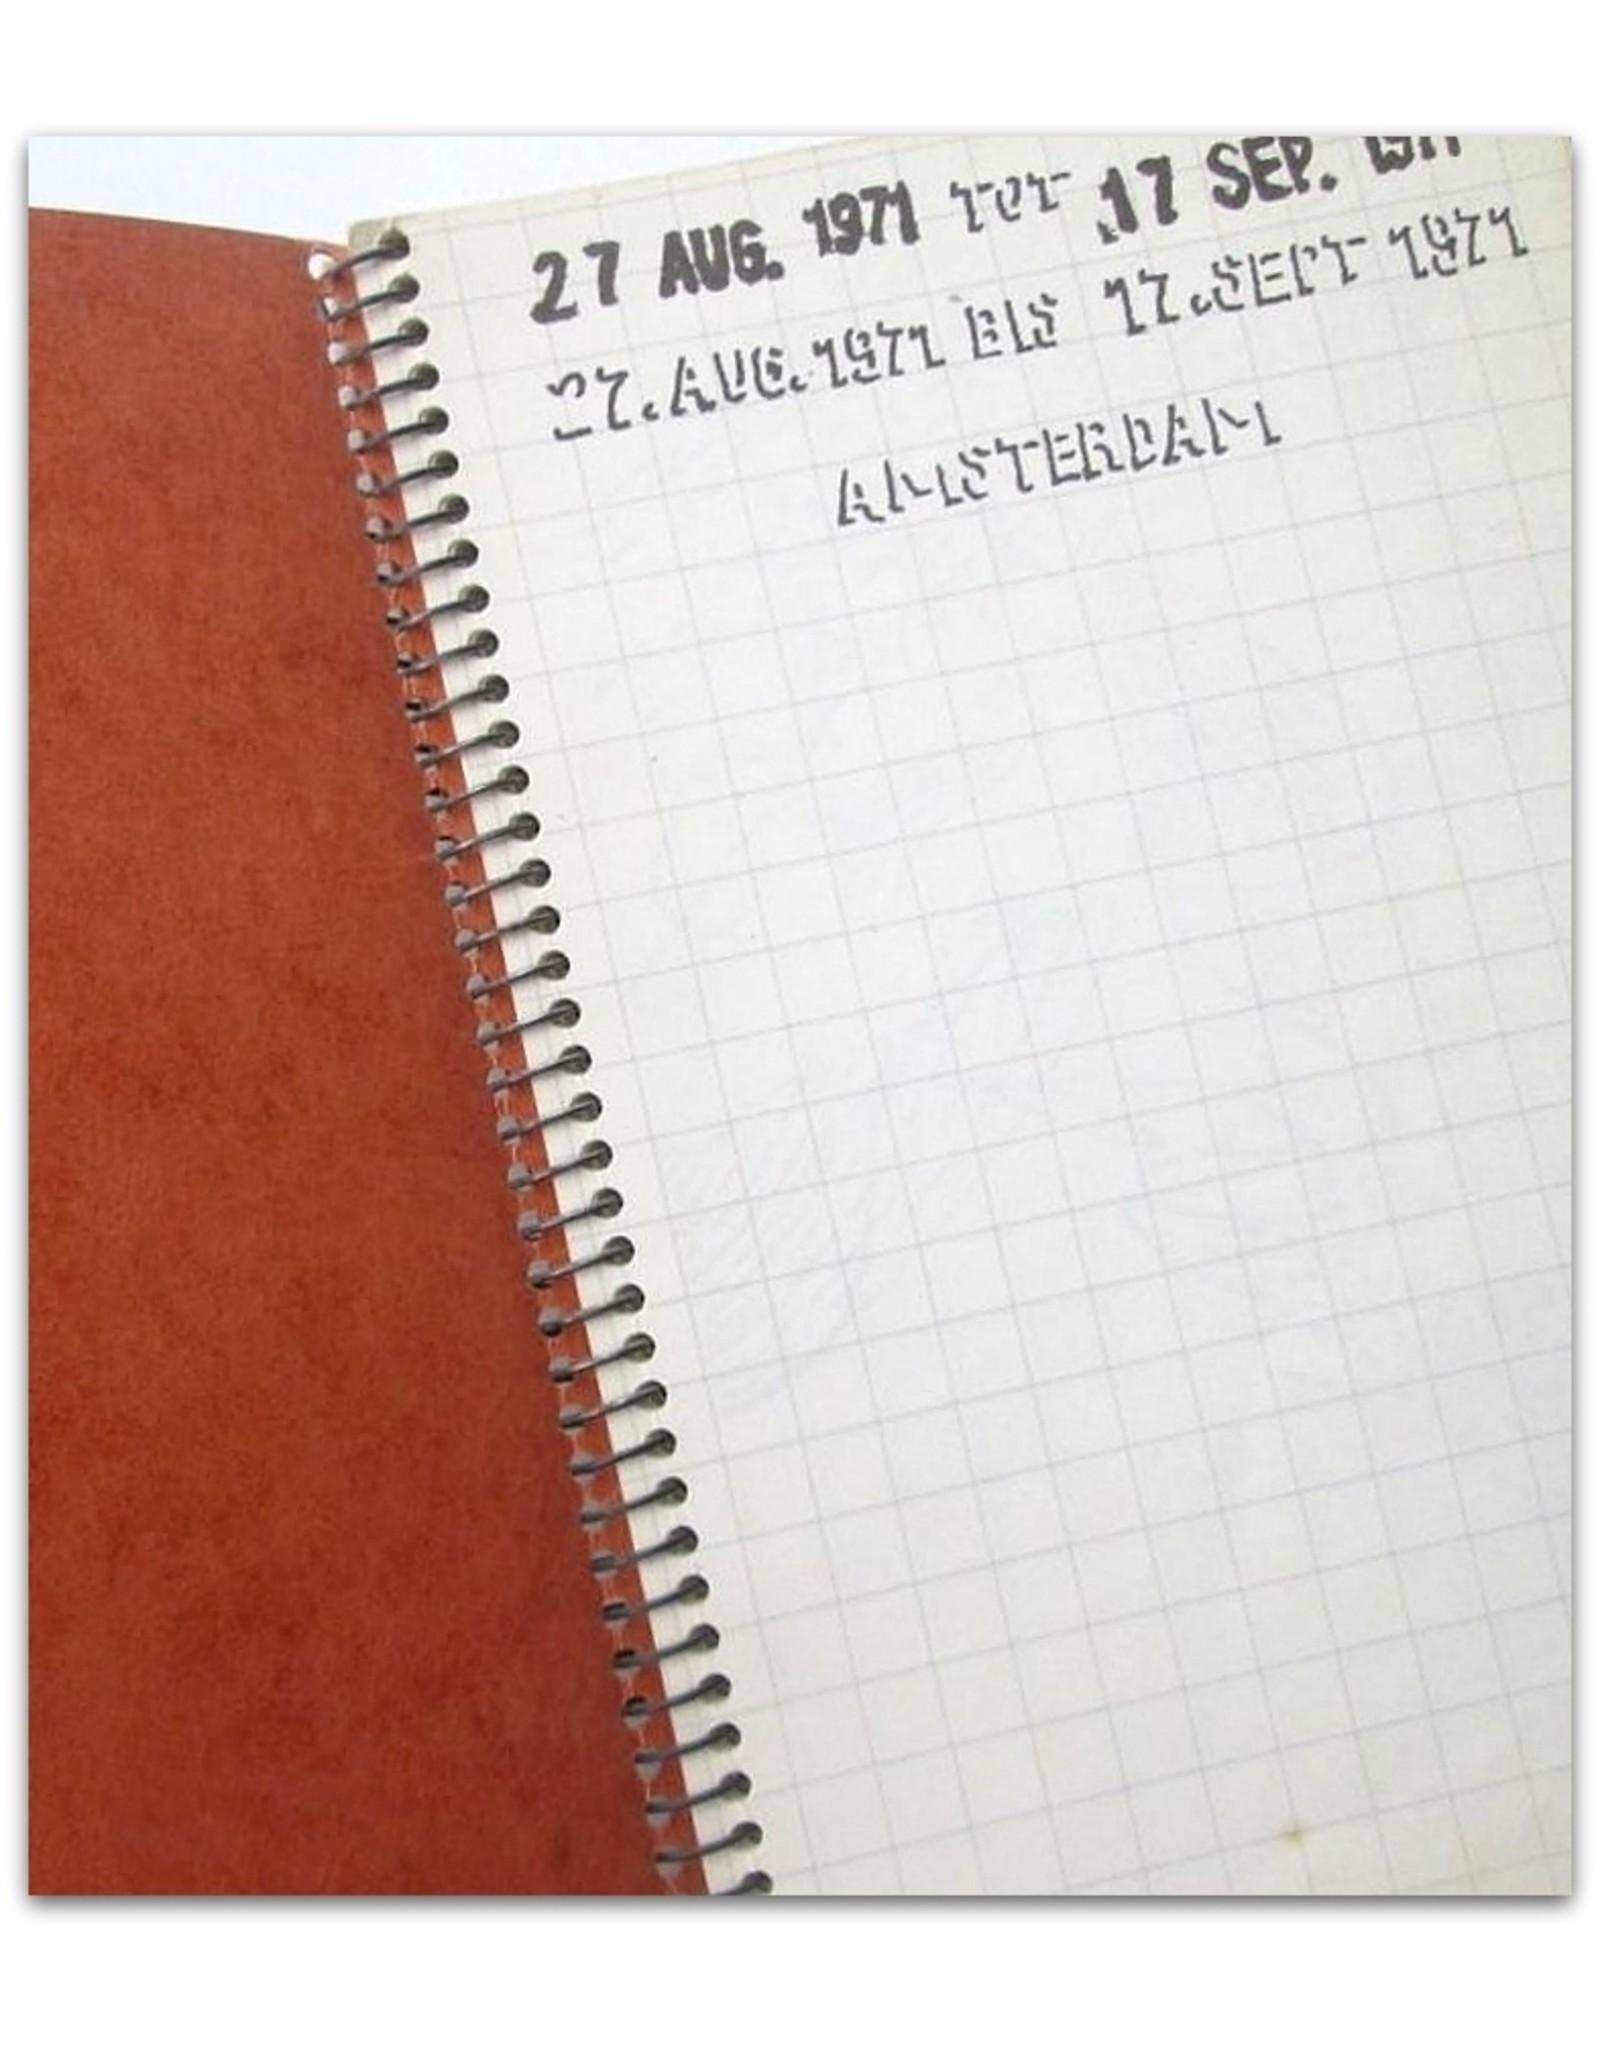 Markus Rätz - 27 Aug. 1971 tot / bis 17 Sept 1971. Amsterdam